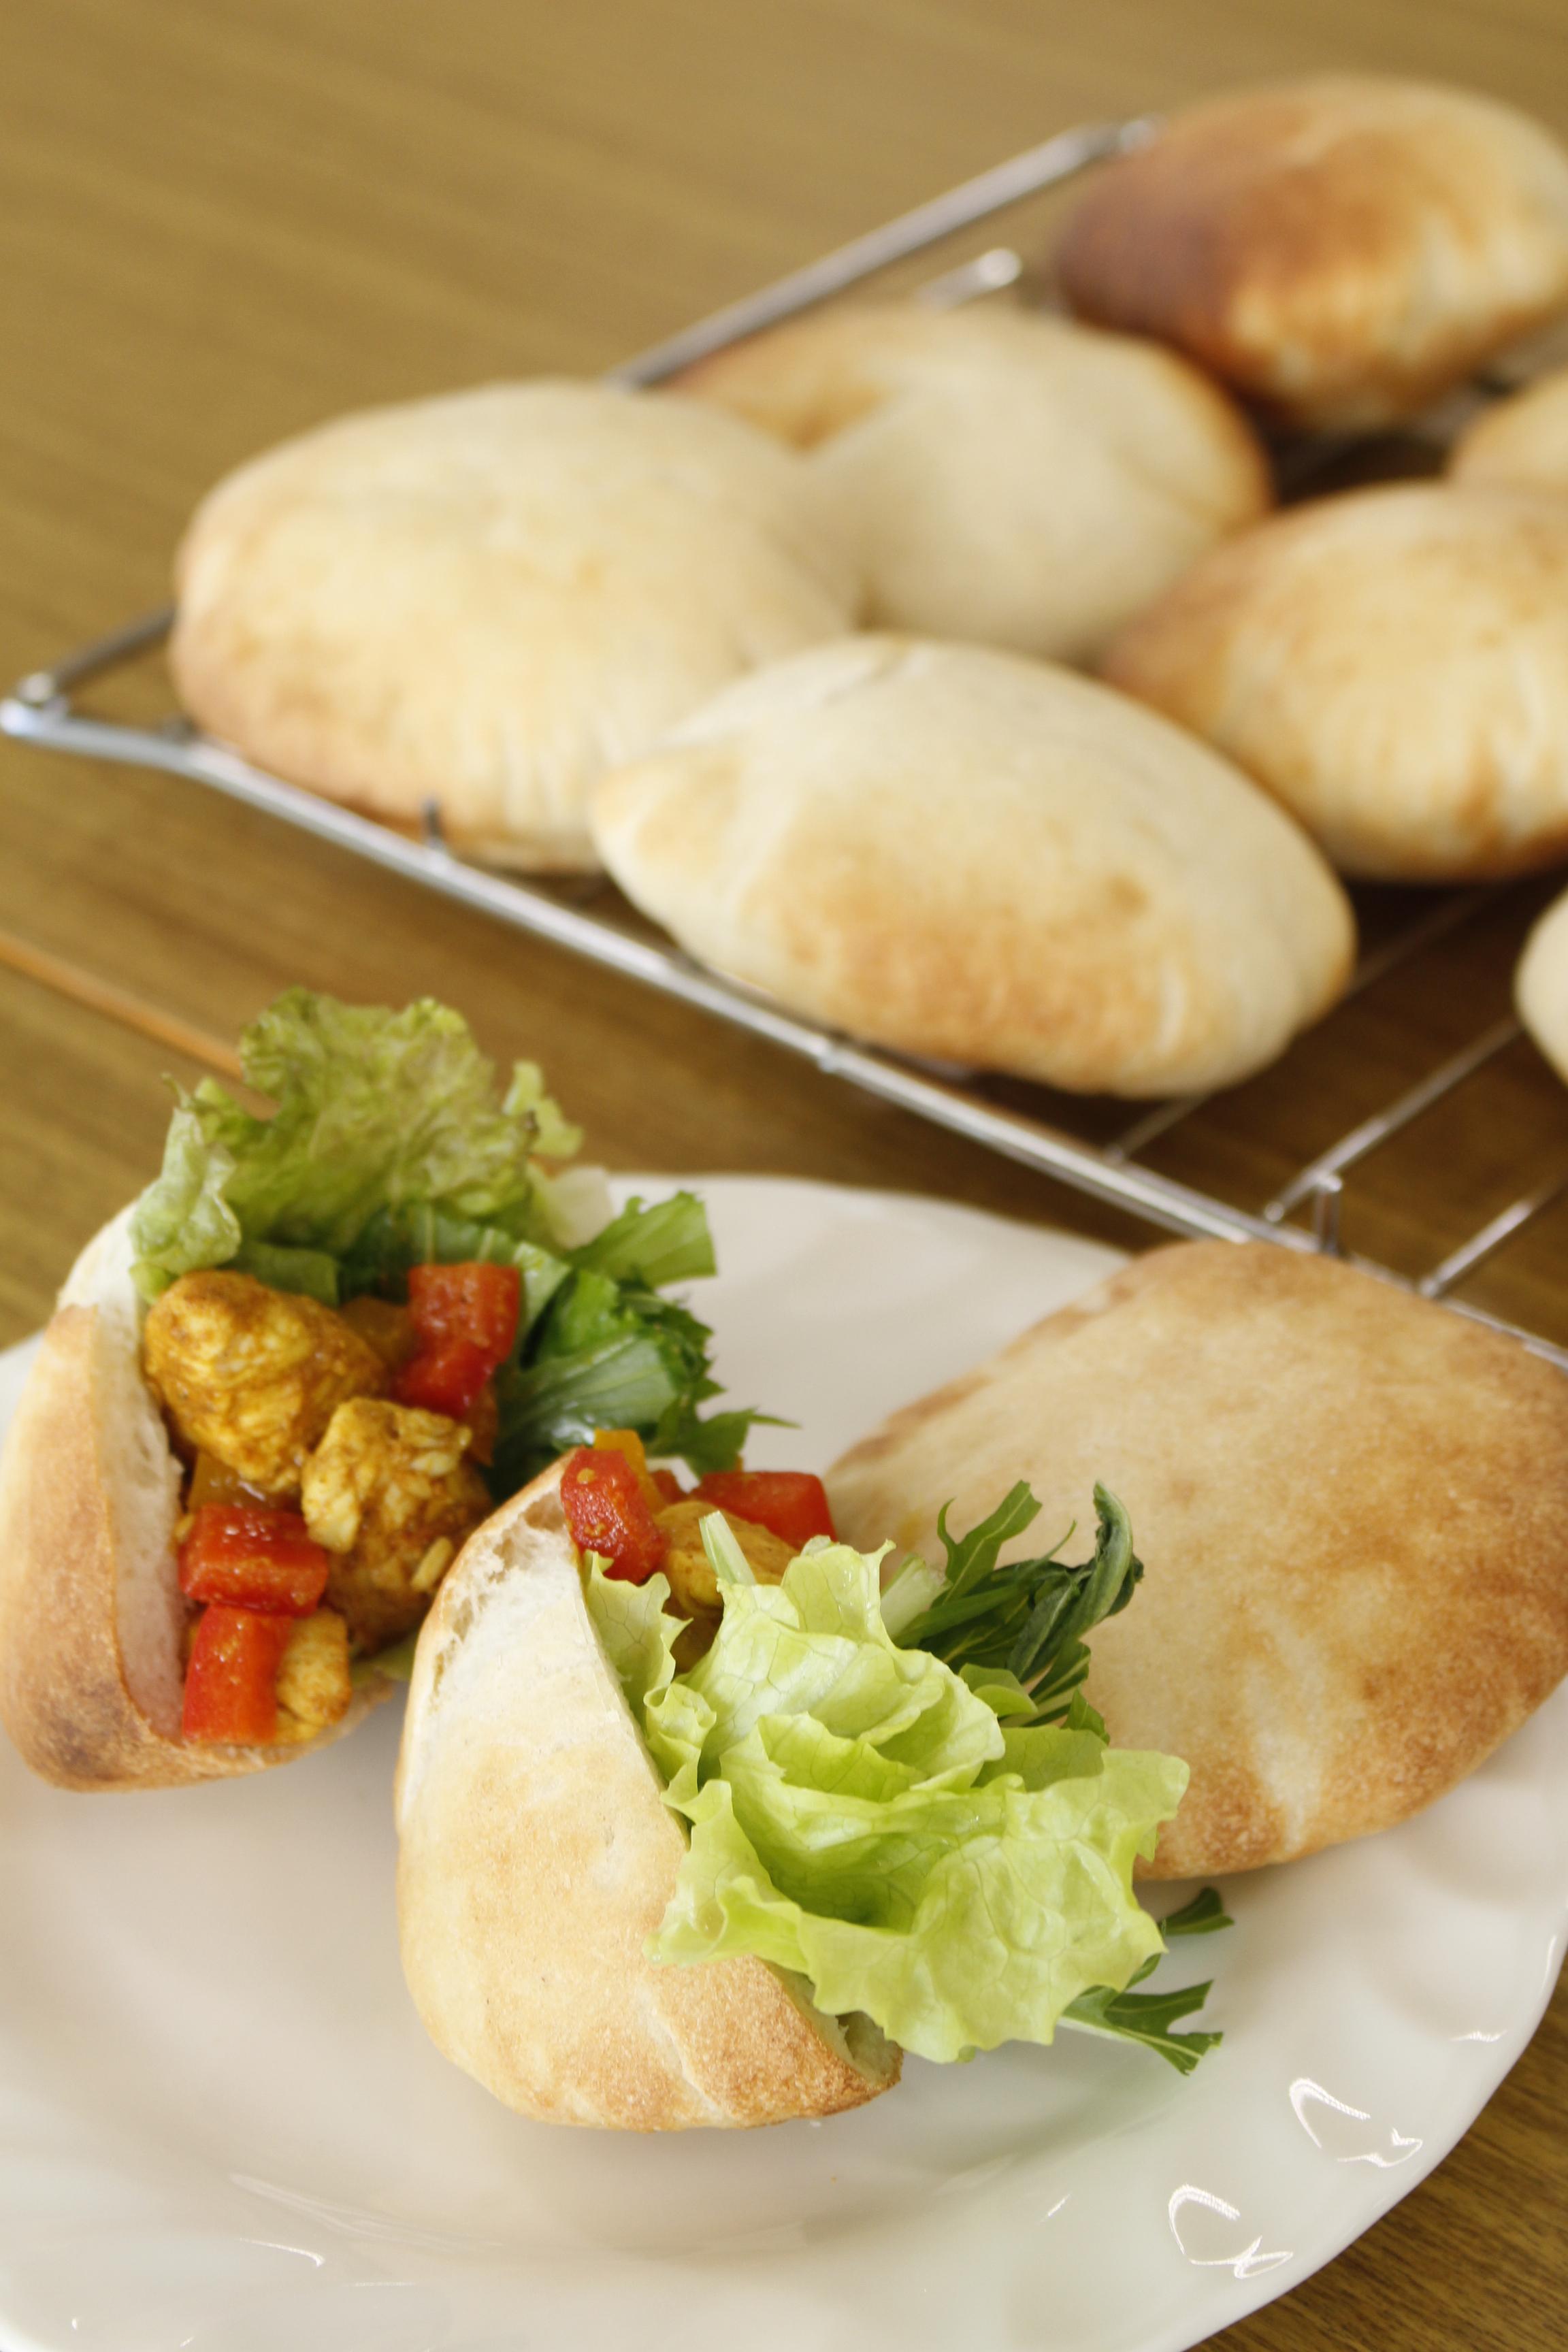 a-ta-sante糖質制限パン料理教室。会館でのレッスン『ピタパン』